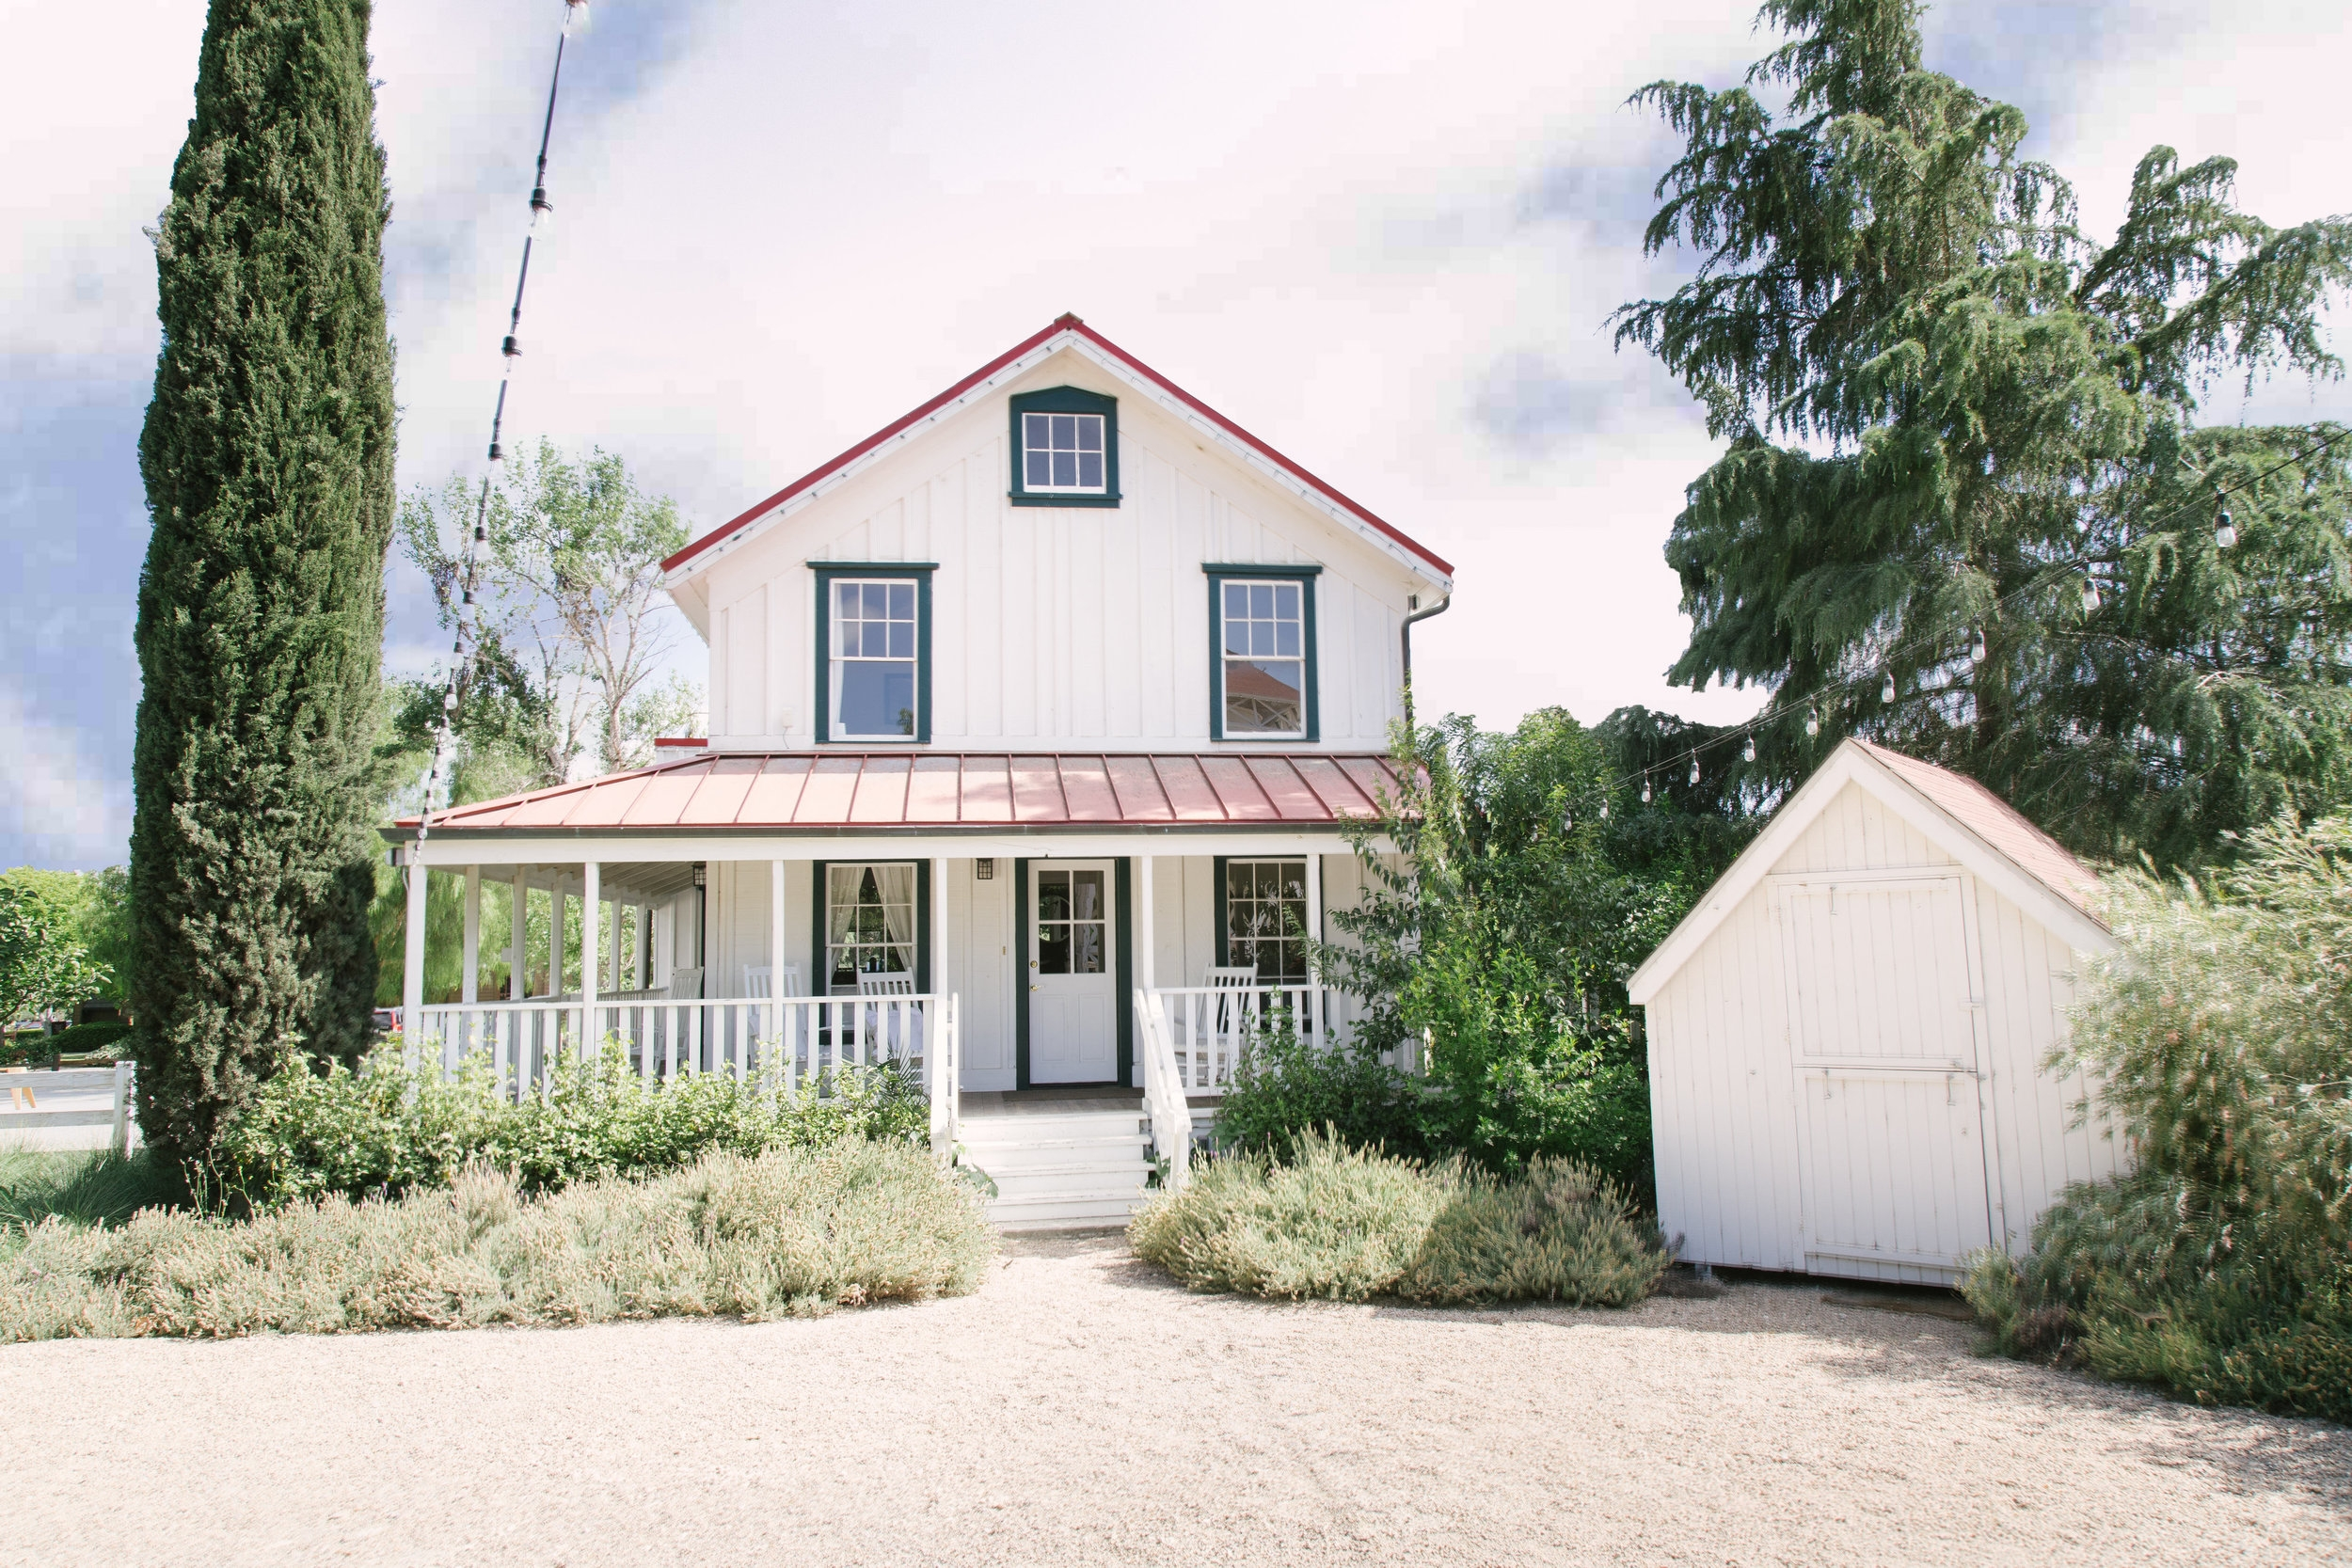 The Los Olivos Hartley House - 2 bedrooms, 1.5 bathrooms, accommodates 4